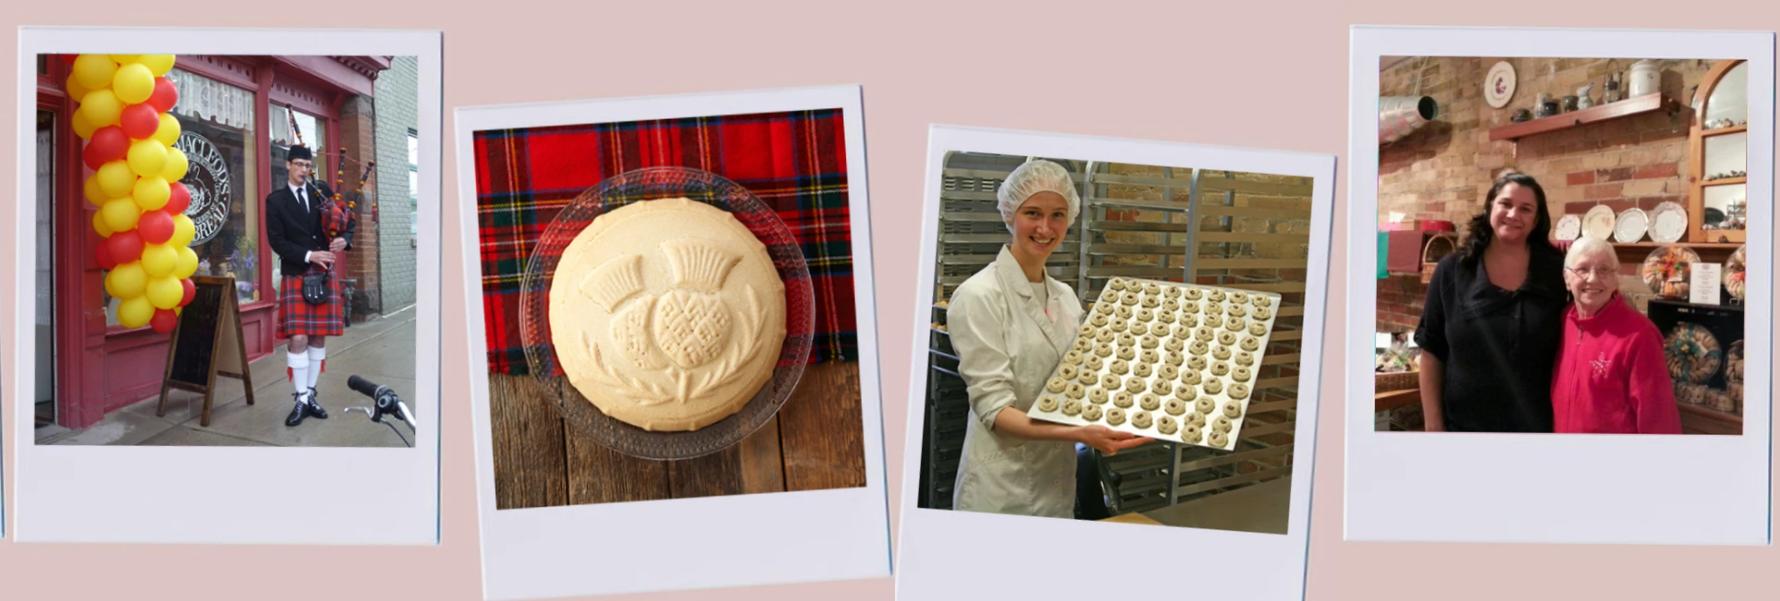 Photos of Mary MacLeods bake shop